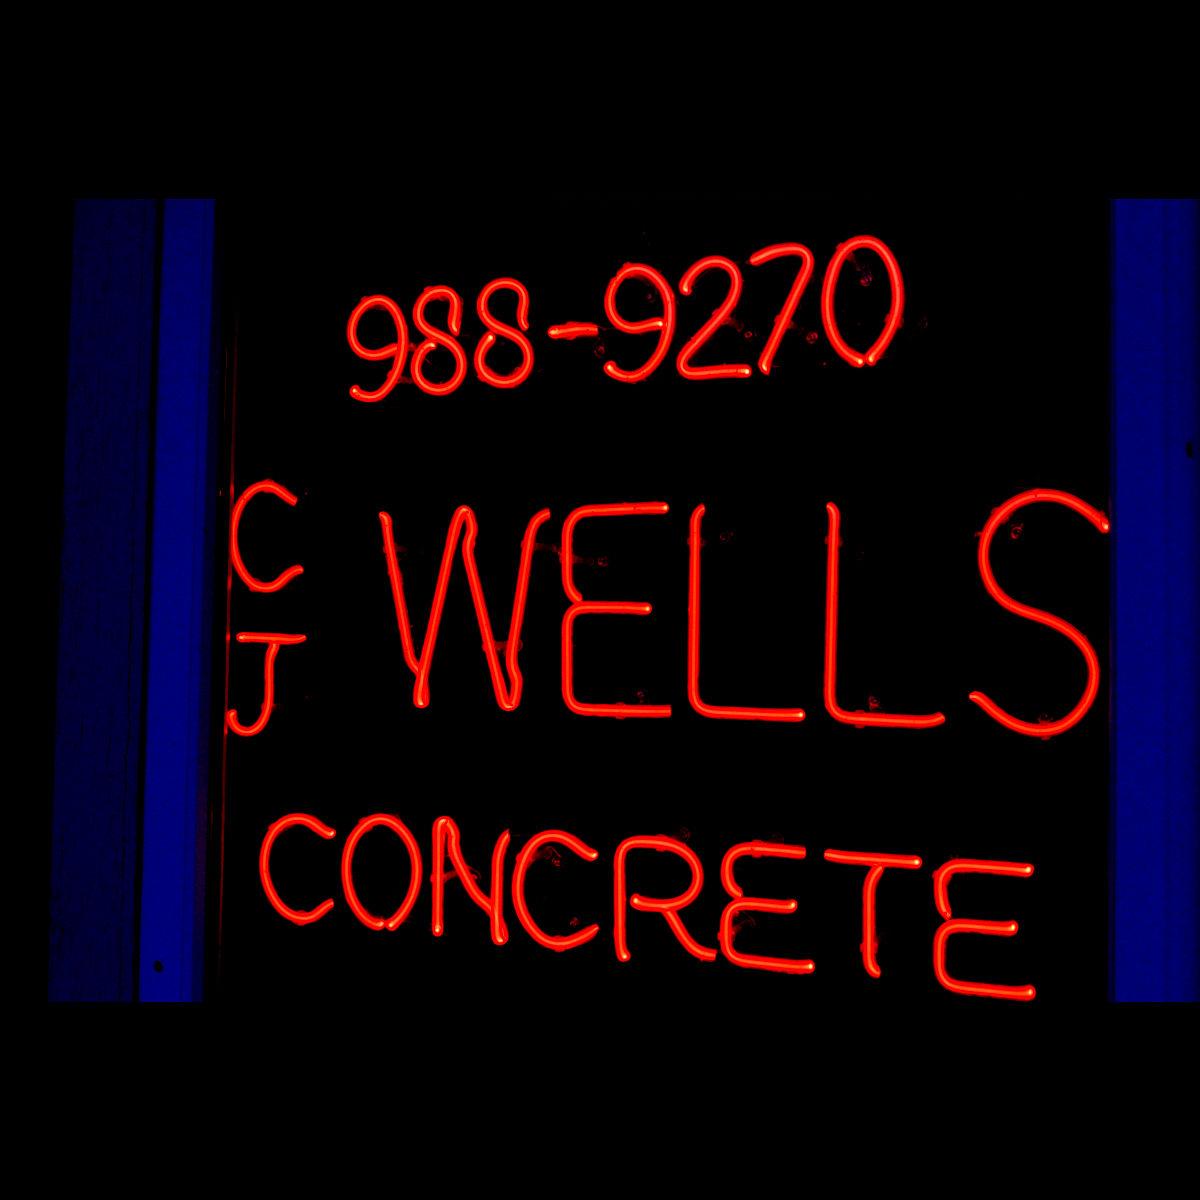 corrected C J Wells Concrete.jpg